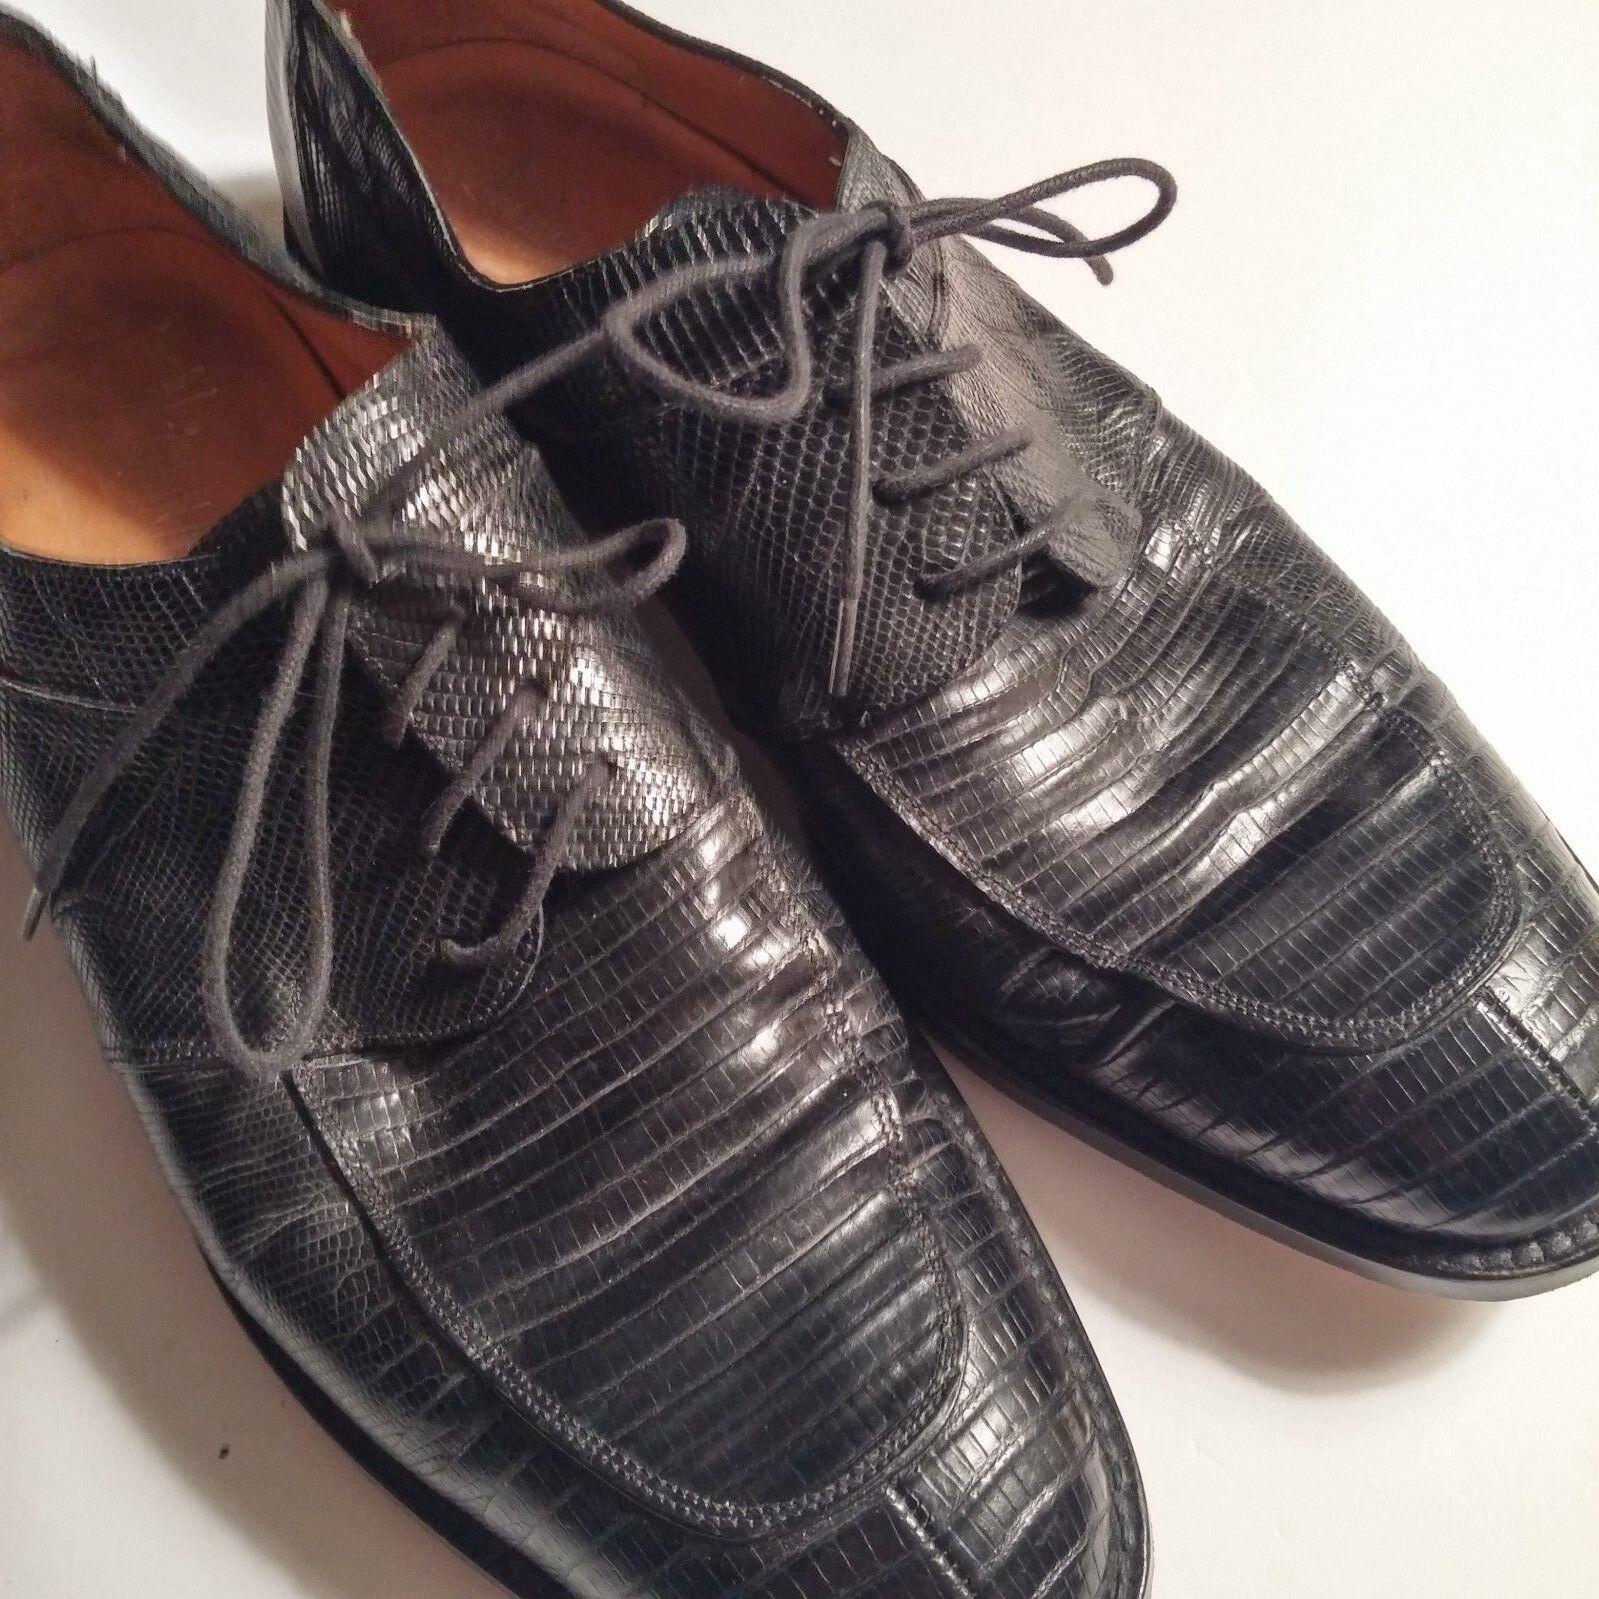 Neiman Marcus M Negro Genuino Lagarto handmadedress Split Toe Derby España